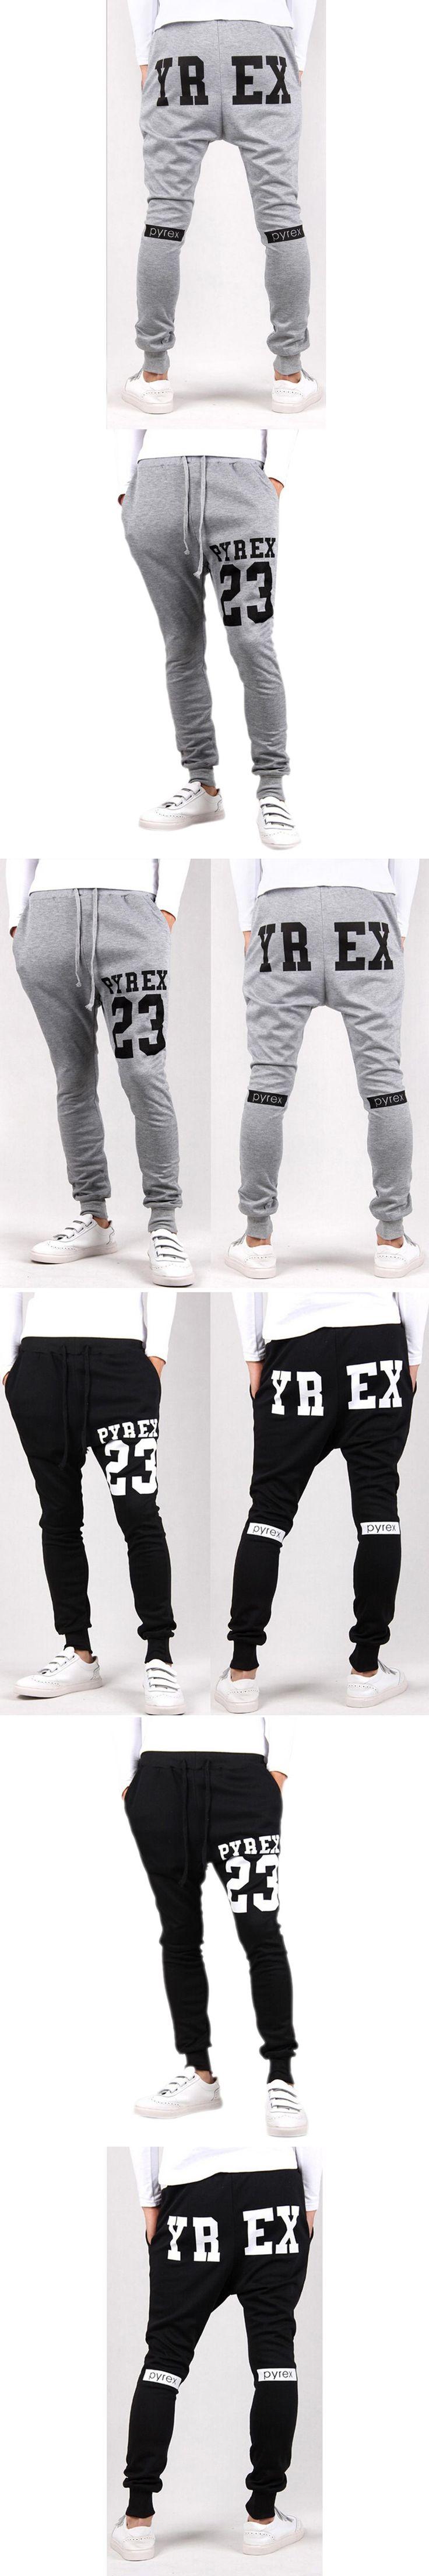 Baggy tapered bandana pant hip hop dance harem sweatpants drop crotch pants men parkour track trousers black Light Gray